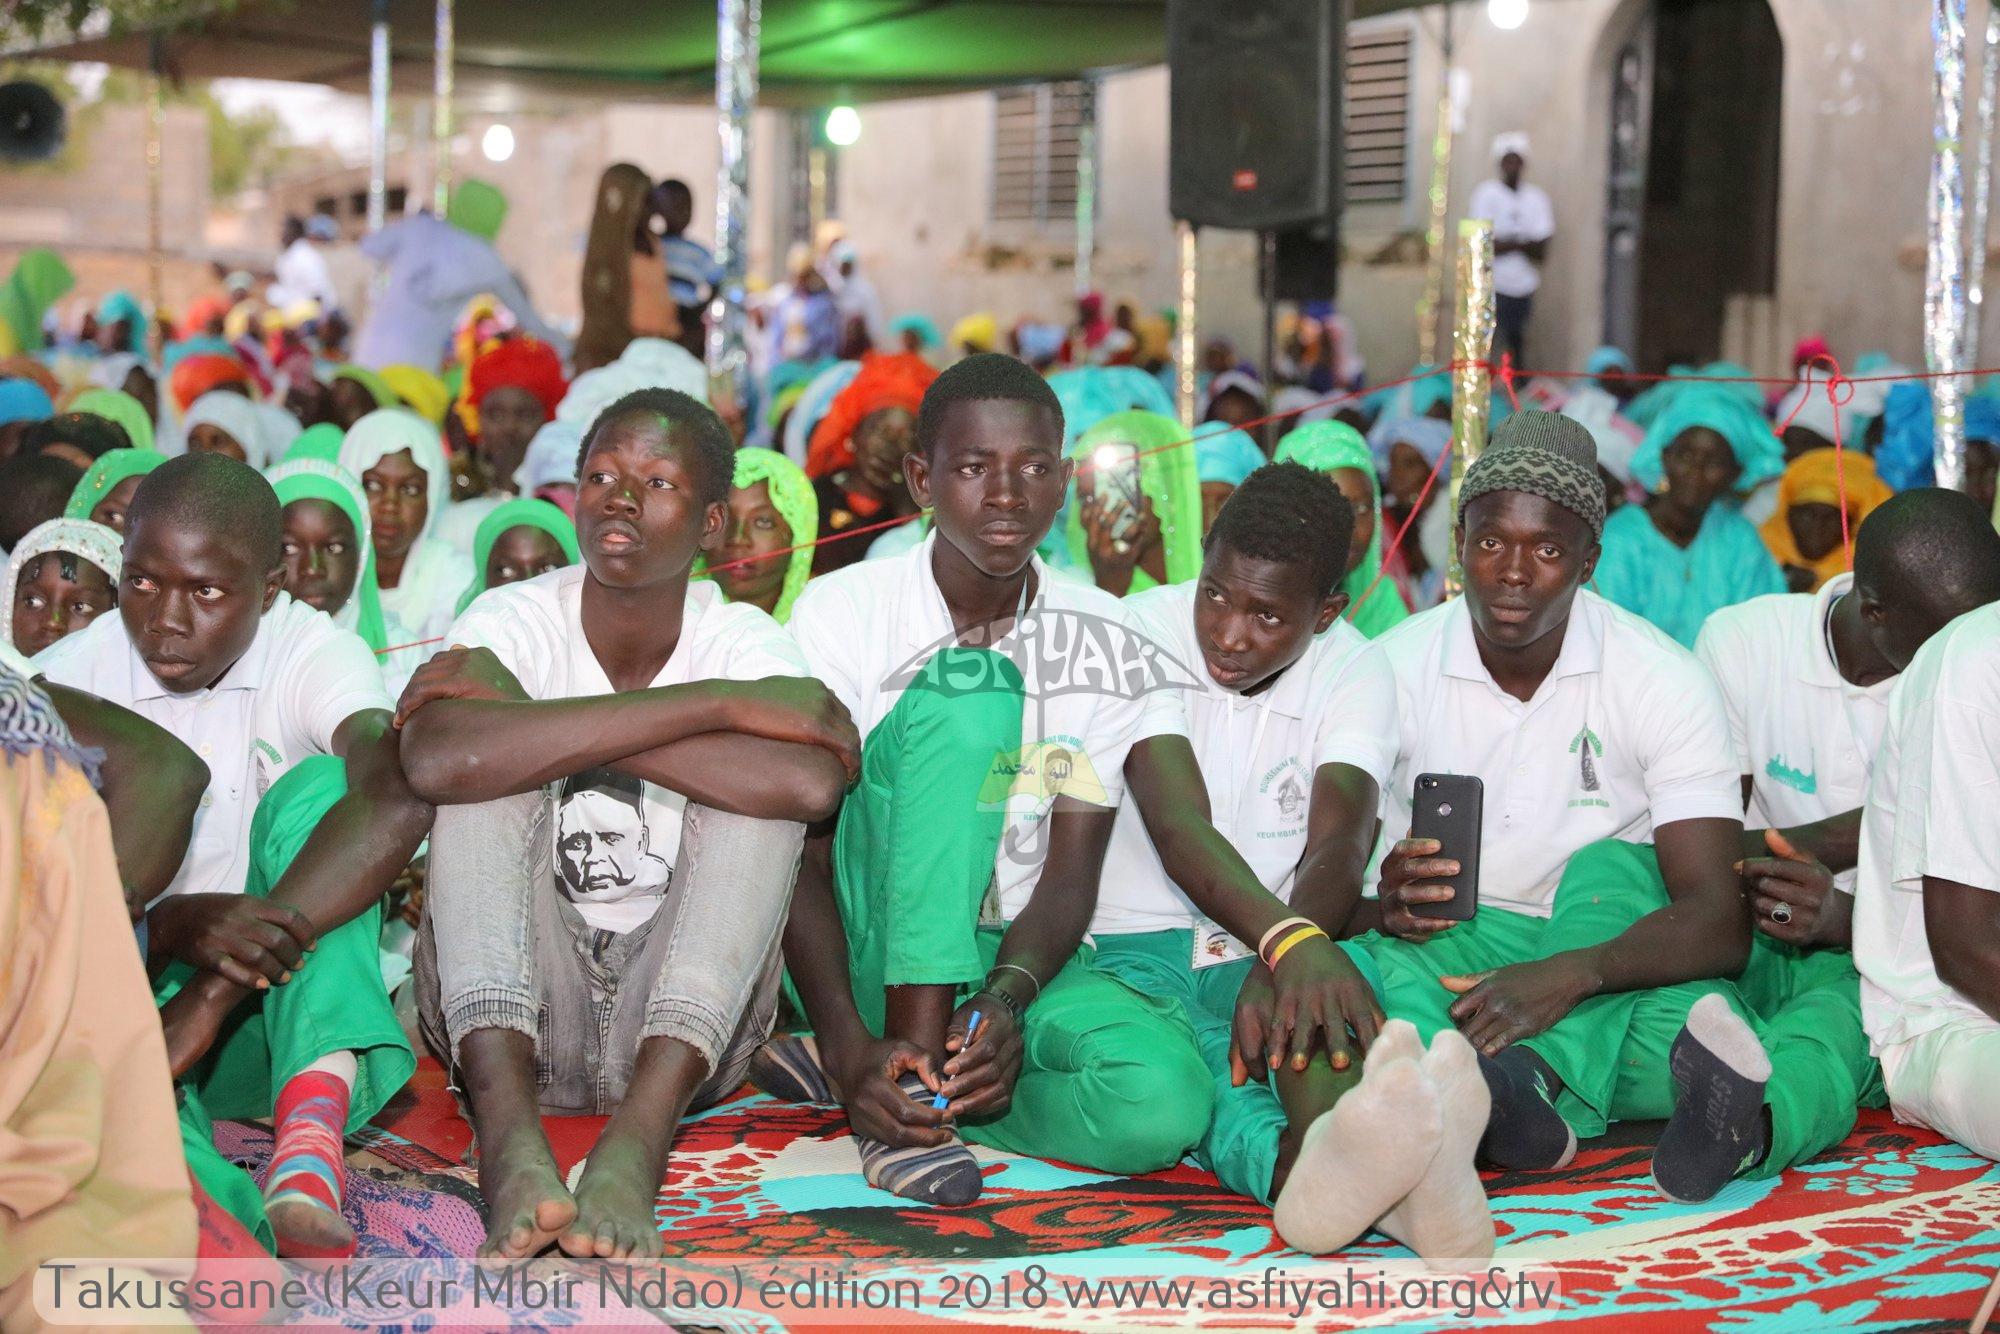 PHOTOS - MBIR NDAO 2018- Les images du Takoussan de la Dahira Mouhsinina Wal Mouhsinaty de Keur Mbir Ndao, presidé par Serigne Habib Sy Mansour